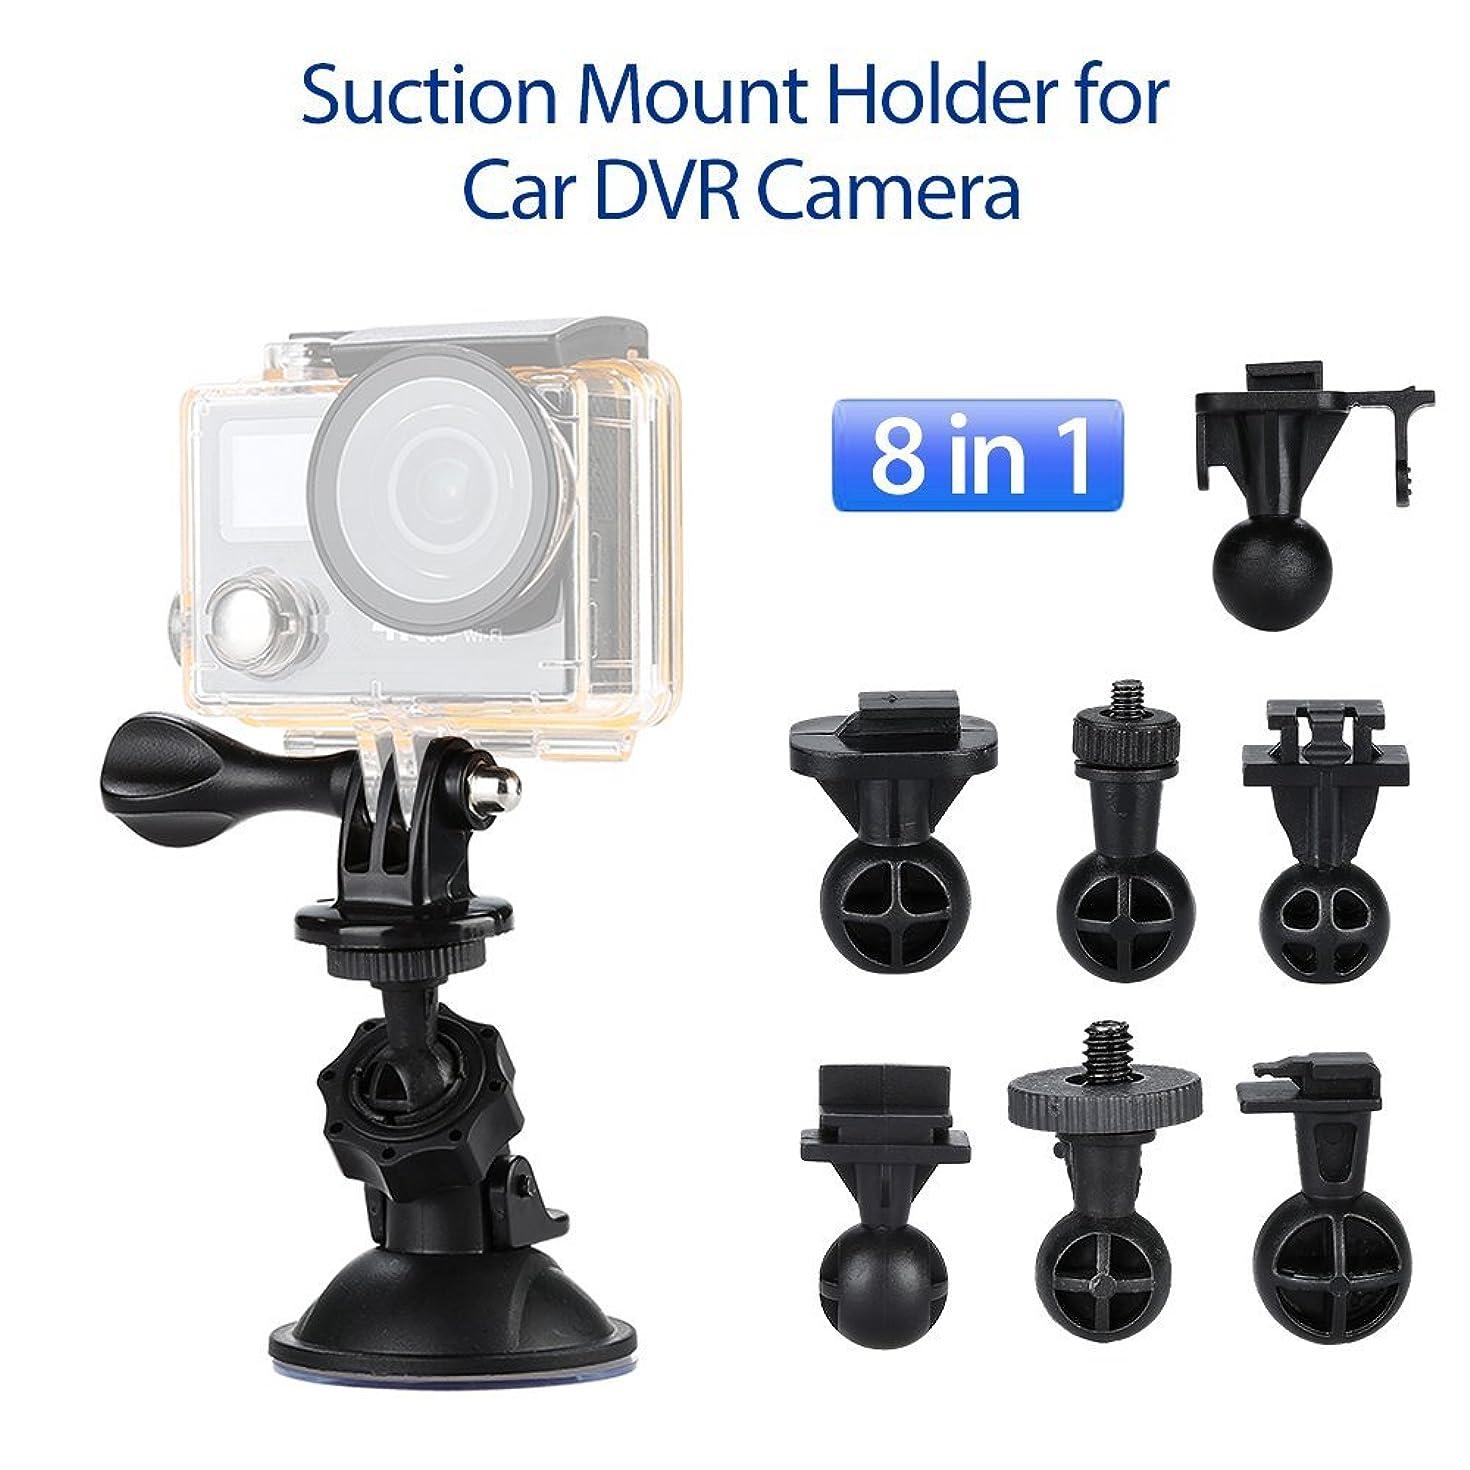 Car Dash Camera Mount Holder Vehicle Video Recorder Windshield & Dashboard Suction Cup Bracket Compatible G1W G1W-C G1W-B LS300W YI Git2P, Suitable for Most Pupular Cam